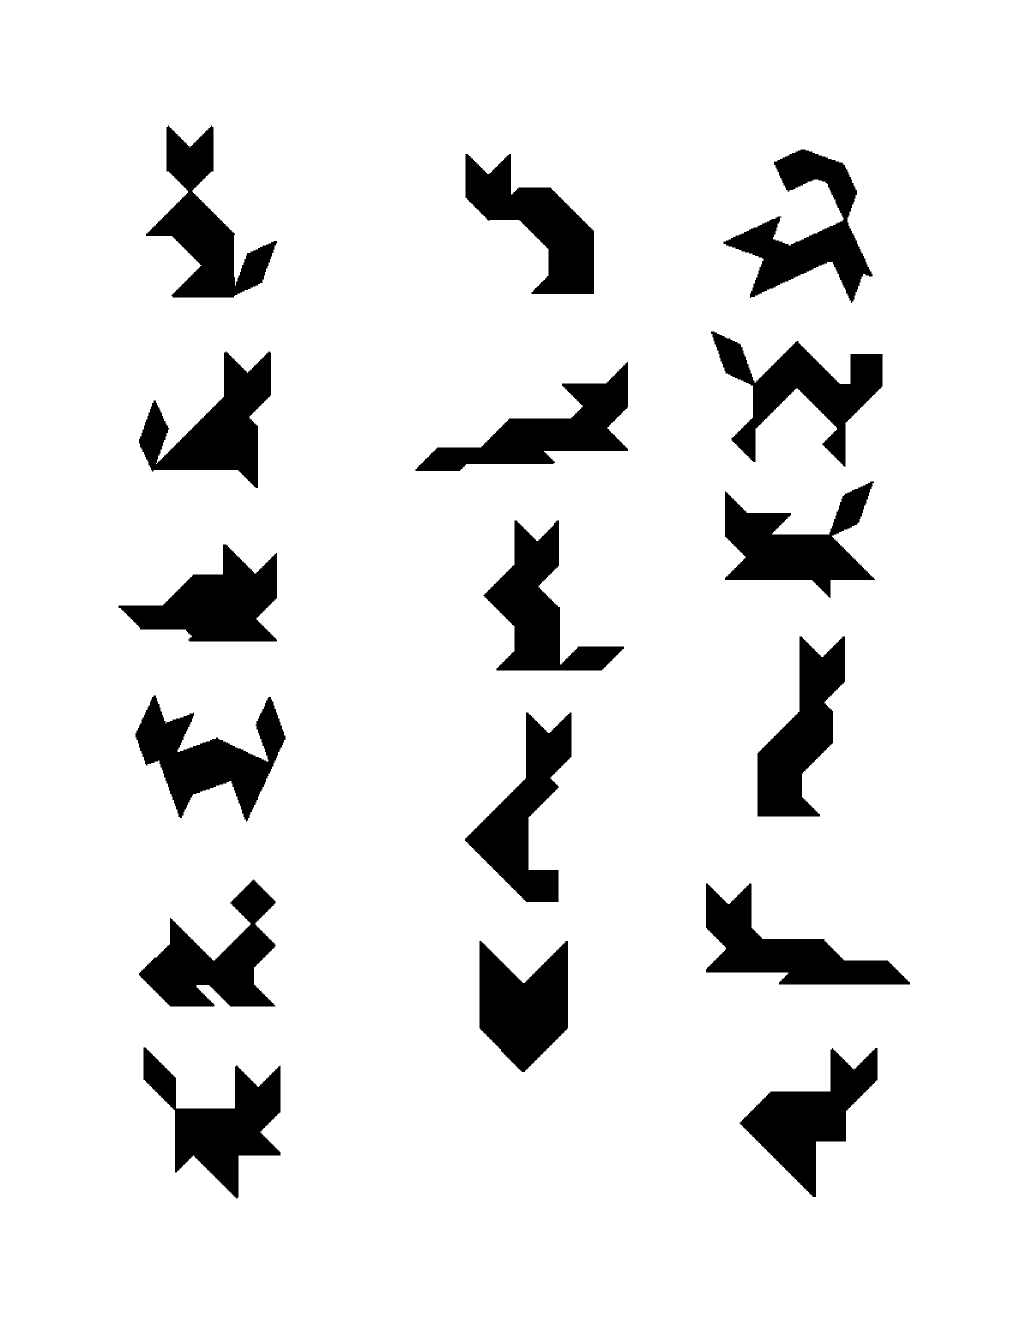 saladogt / Geometry Unit 8